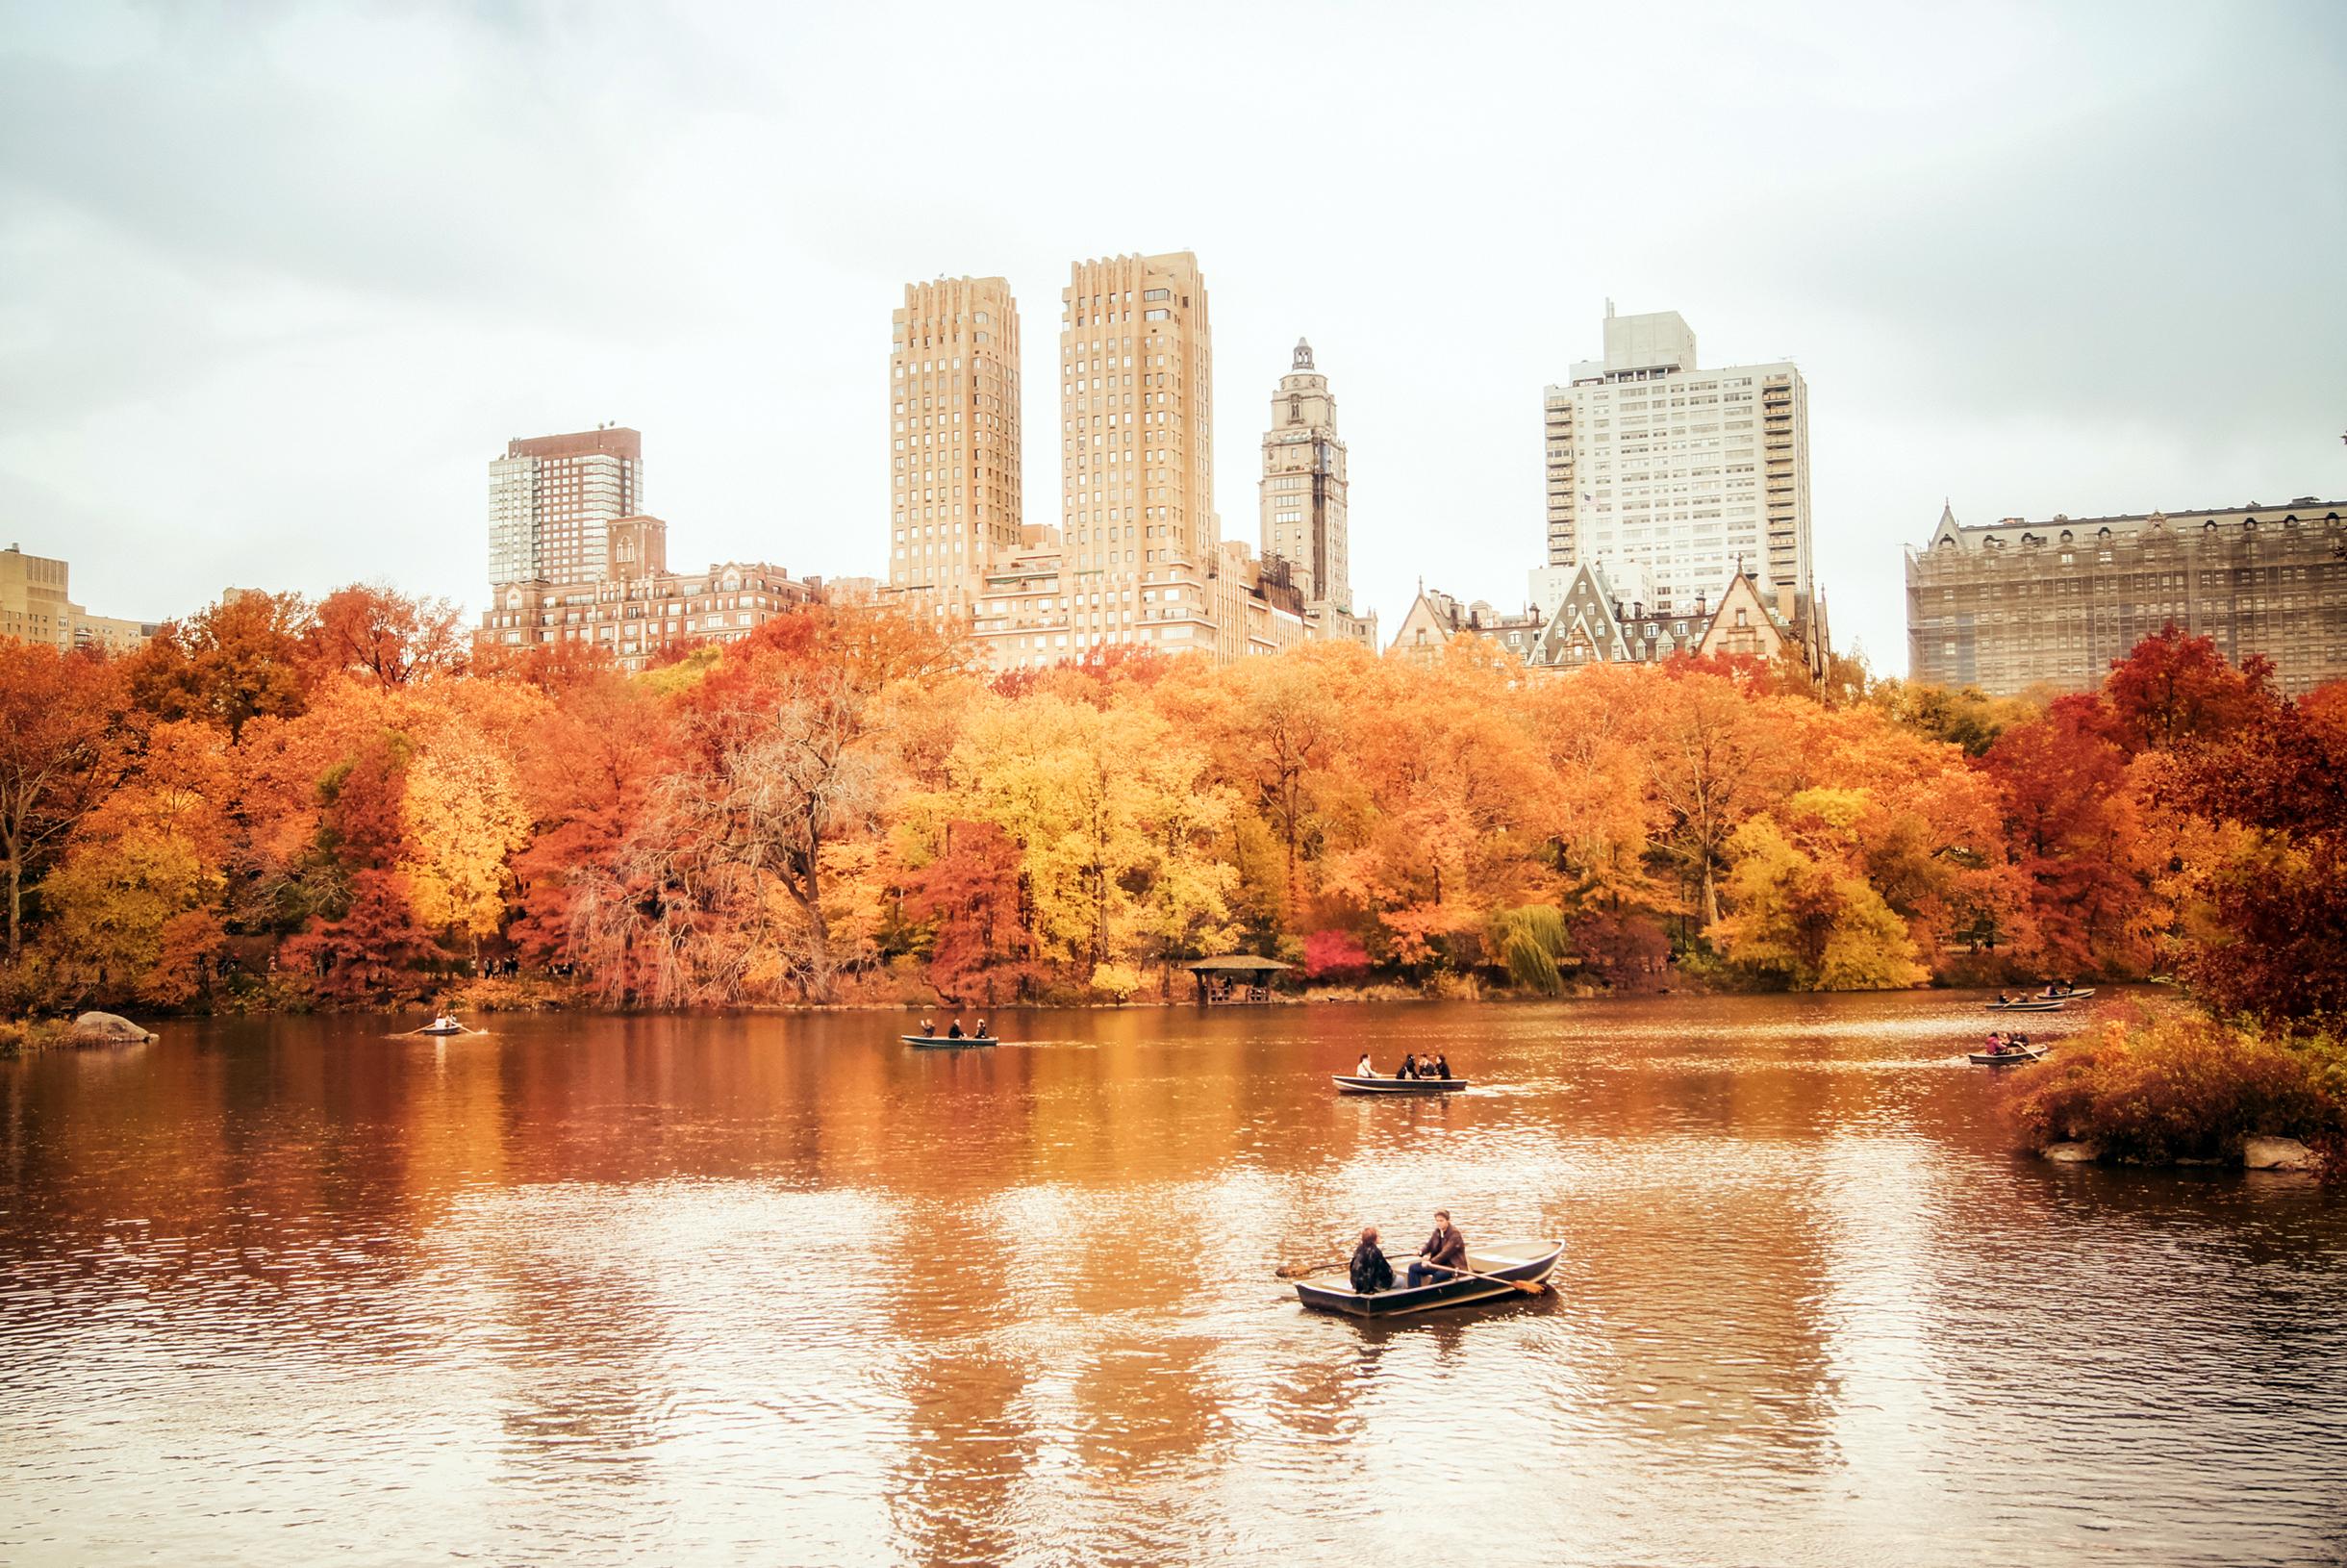 New York Central Park Wallpapers HD Desktop ImageBankbiz 2440x1630